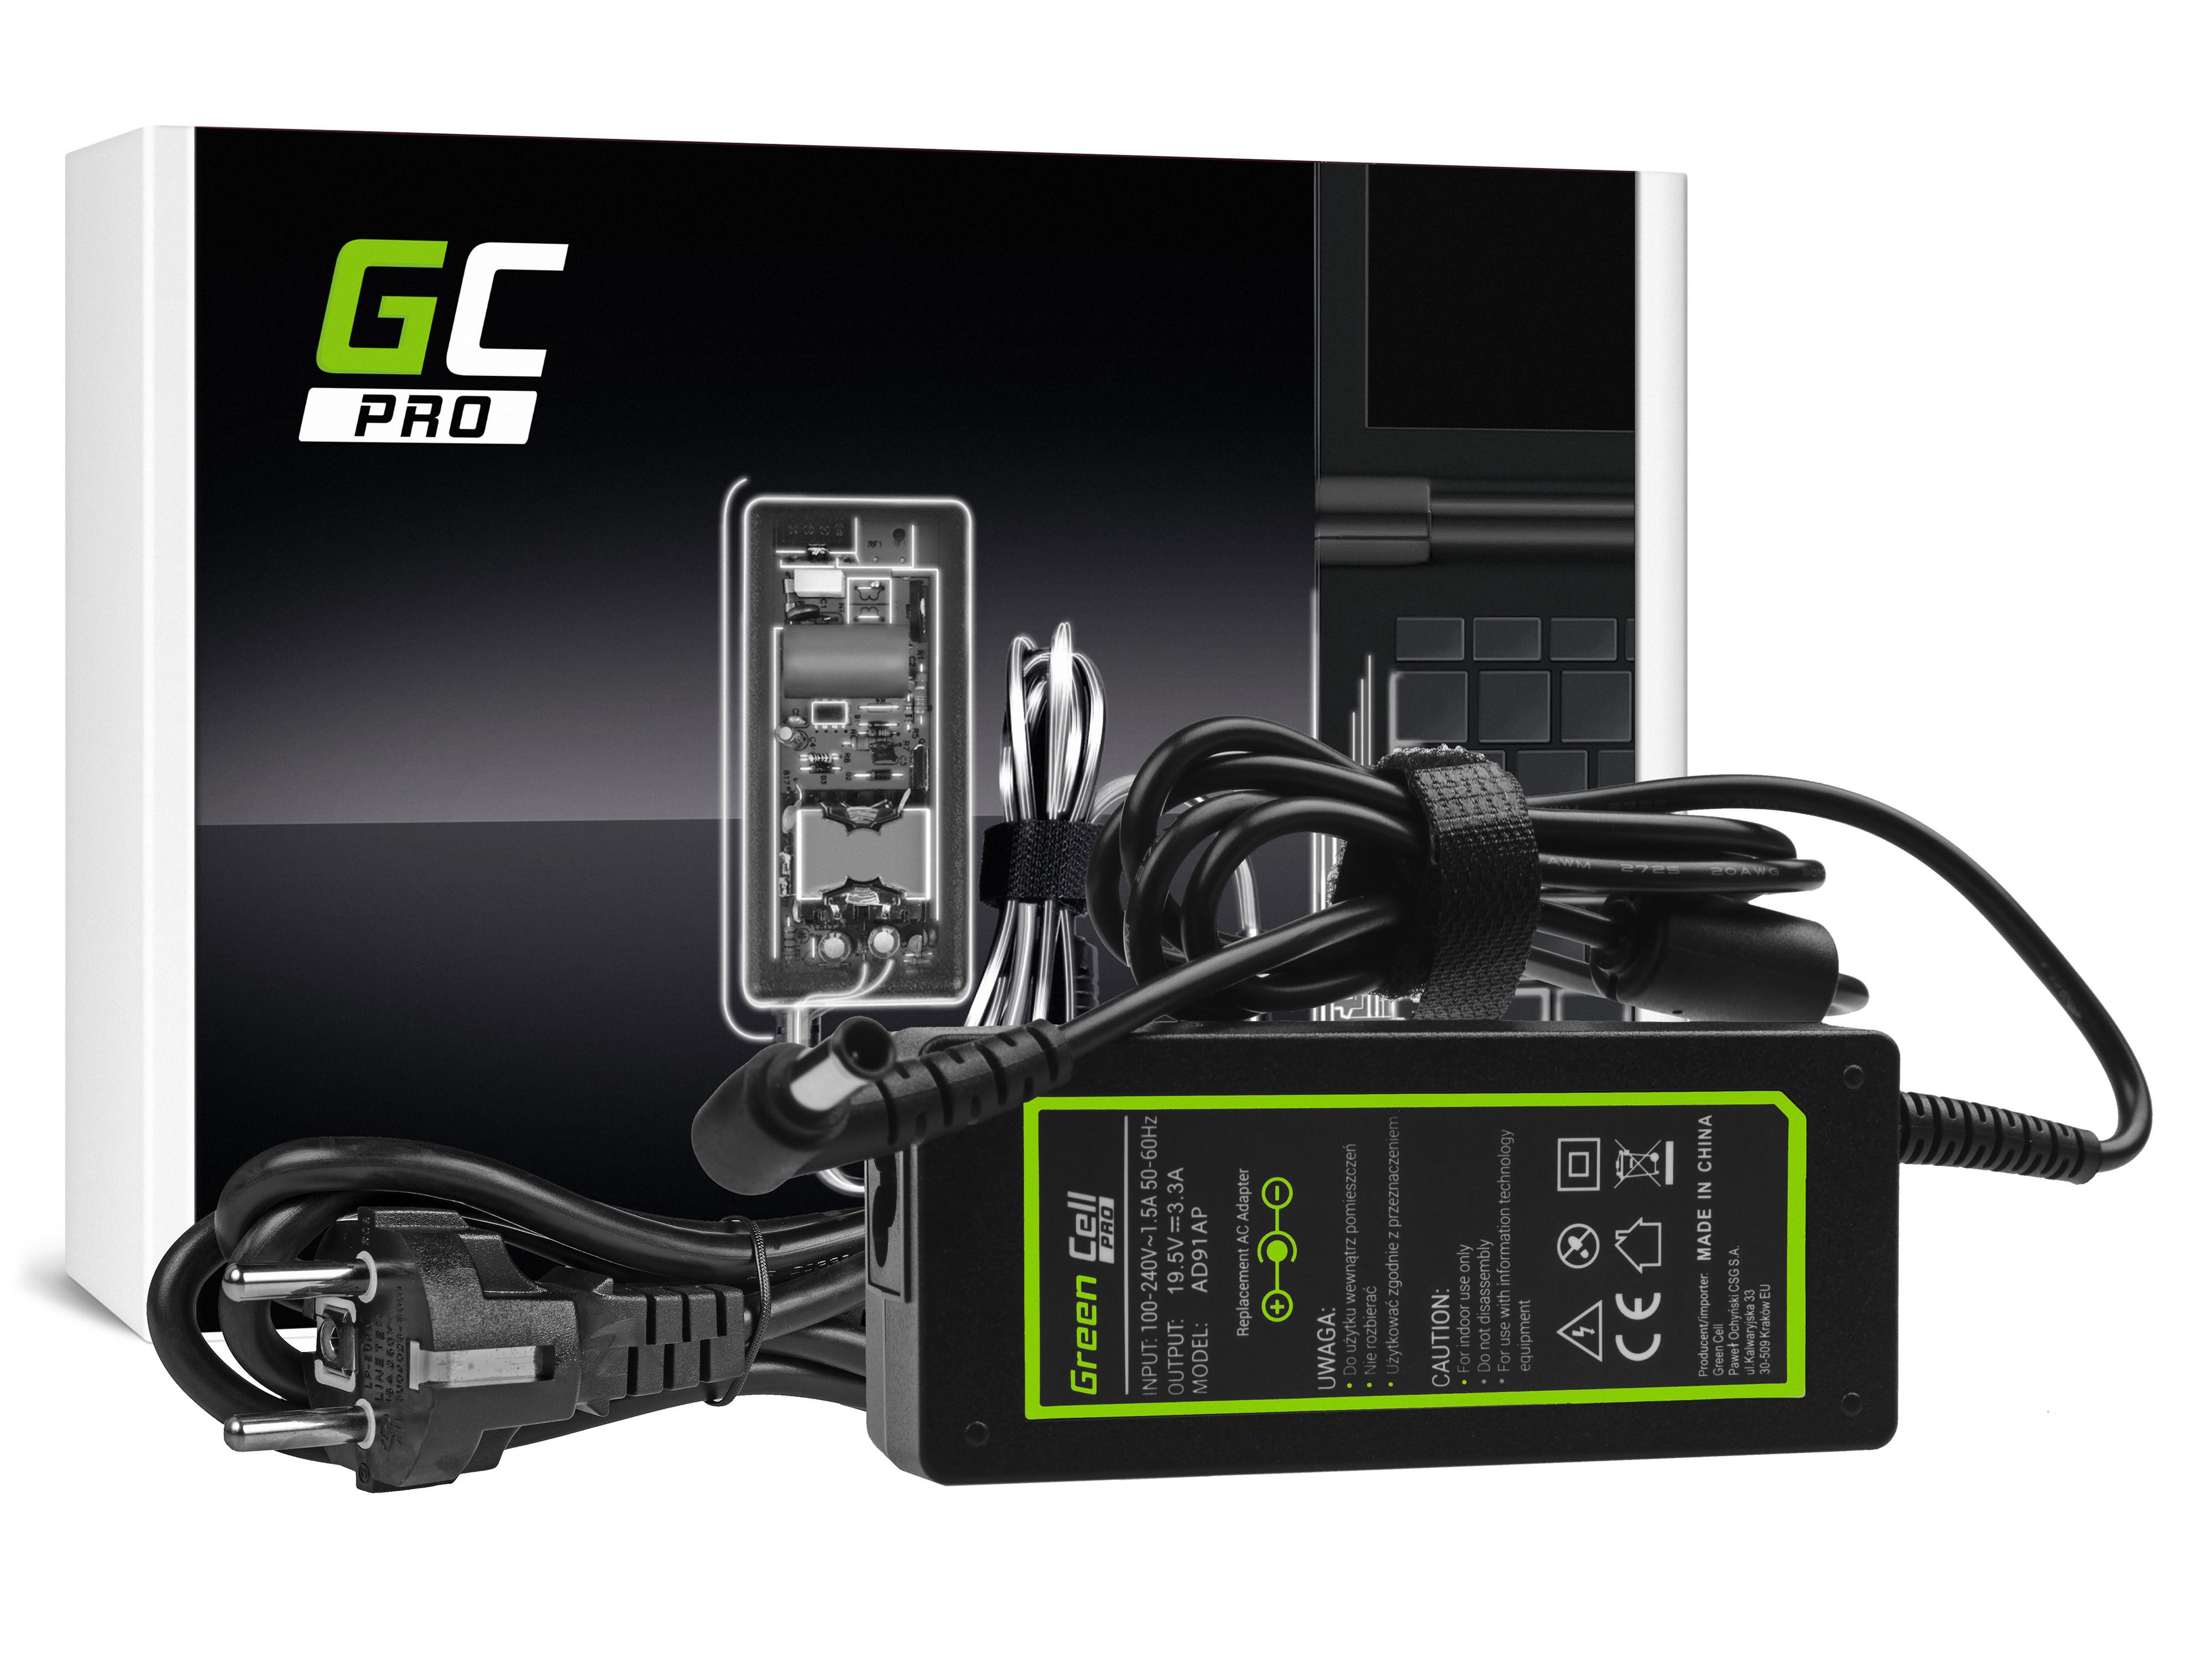 Green Cell AD91AP Adaptér Nabíječka Sony VGP-AC19V43 VGP-AC19V48 19.5V 3.3A 65W pro Sony Vaio SVF15 SVF1521C6EW SVF152A29M | konektor 6.5-4.4mm